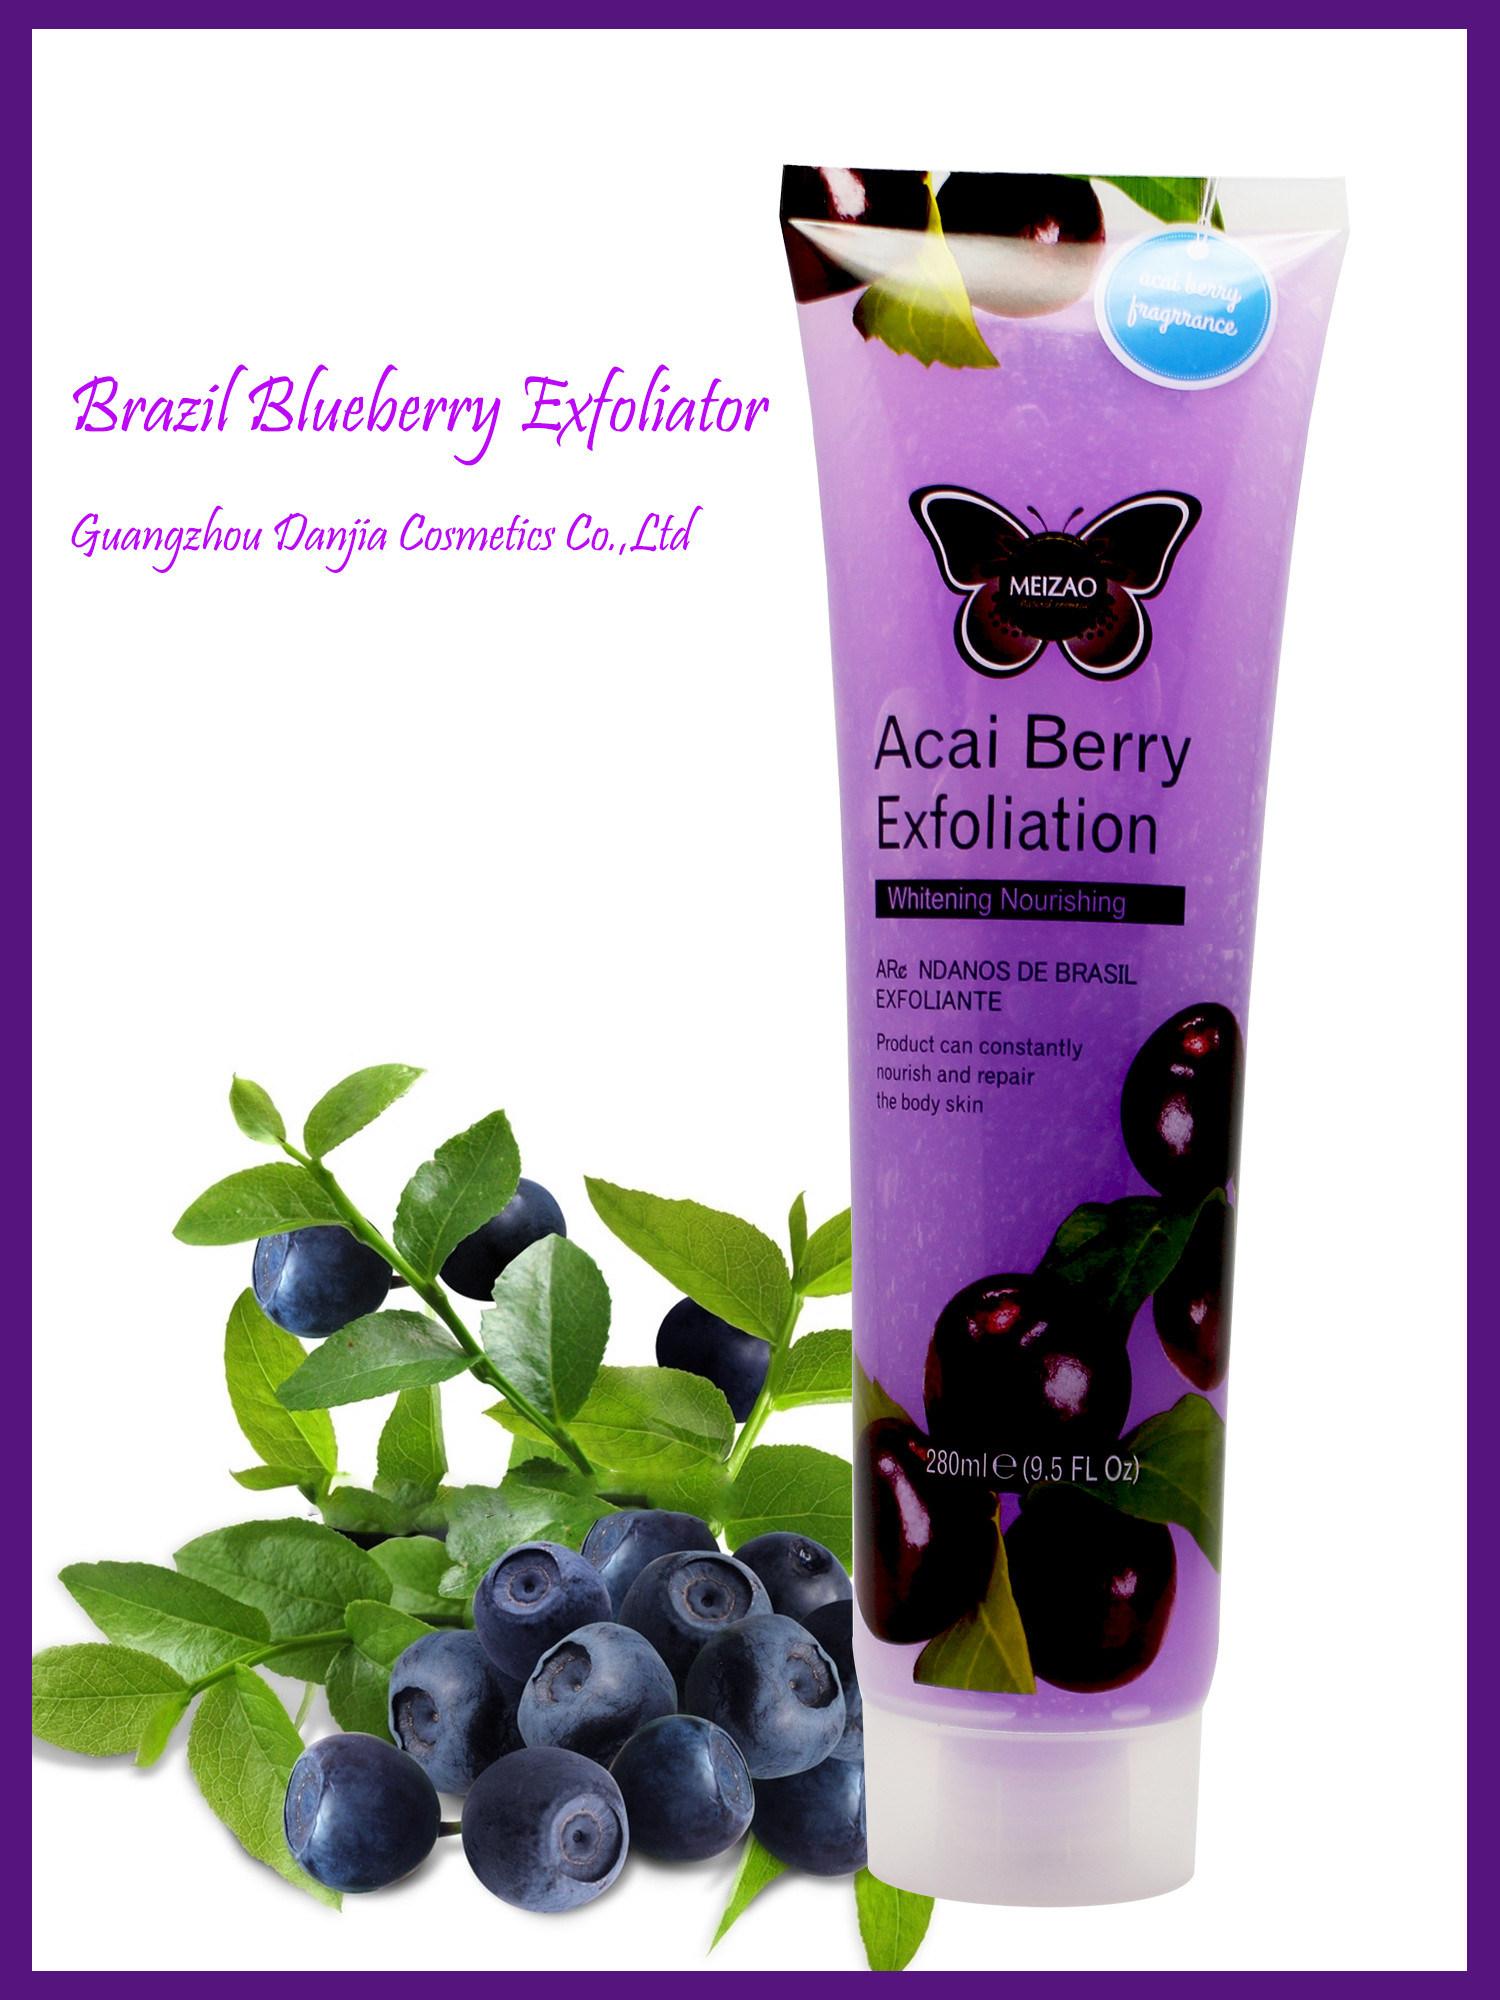 Brazil Blueberry Acai Berry Exfoliator